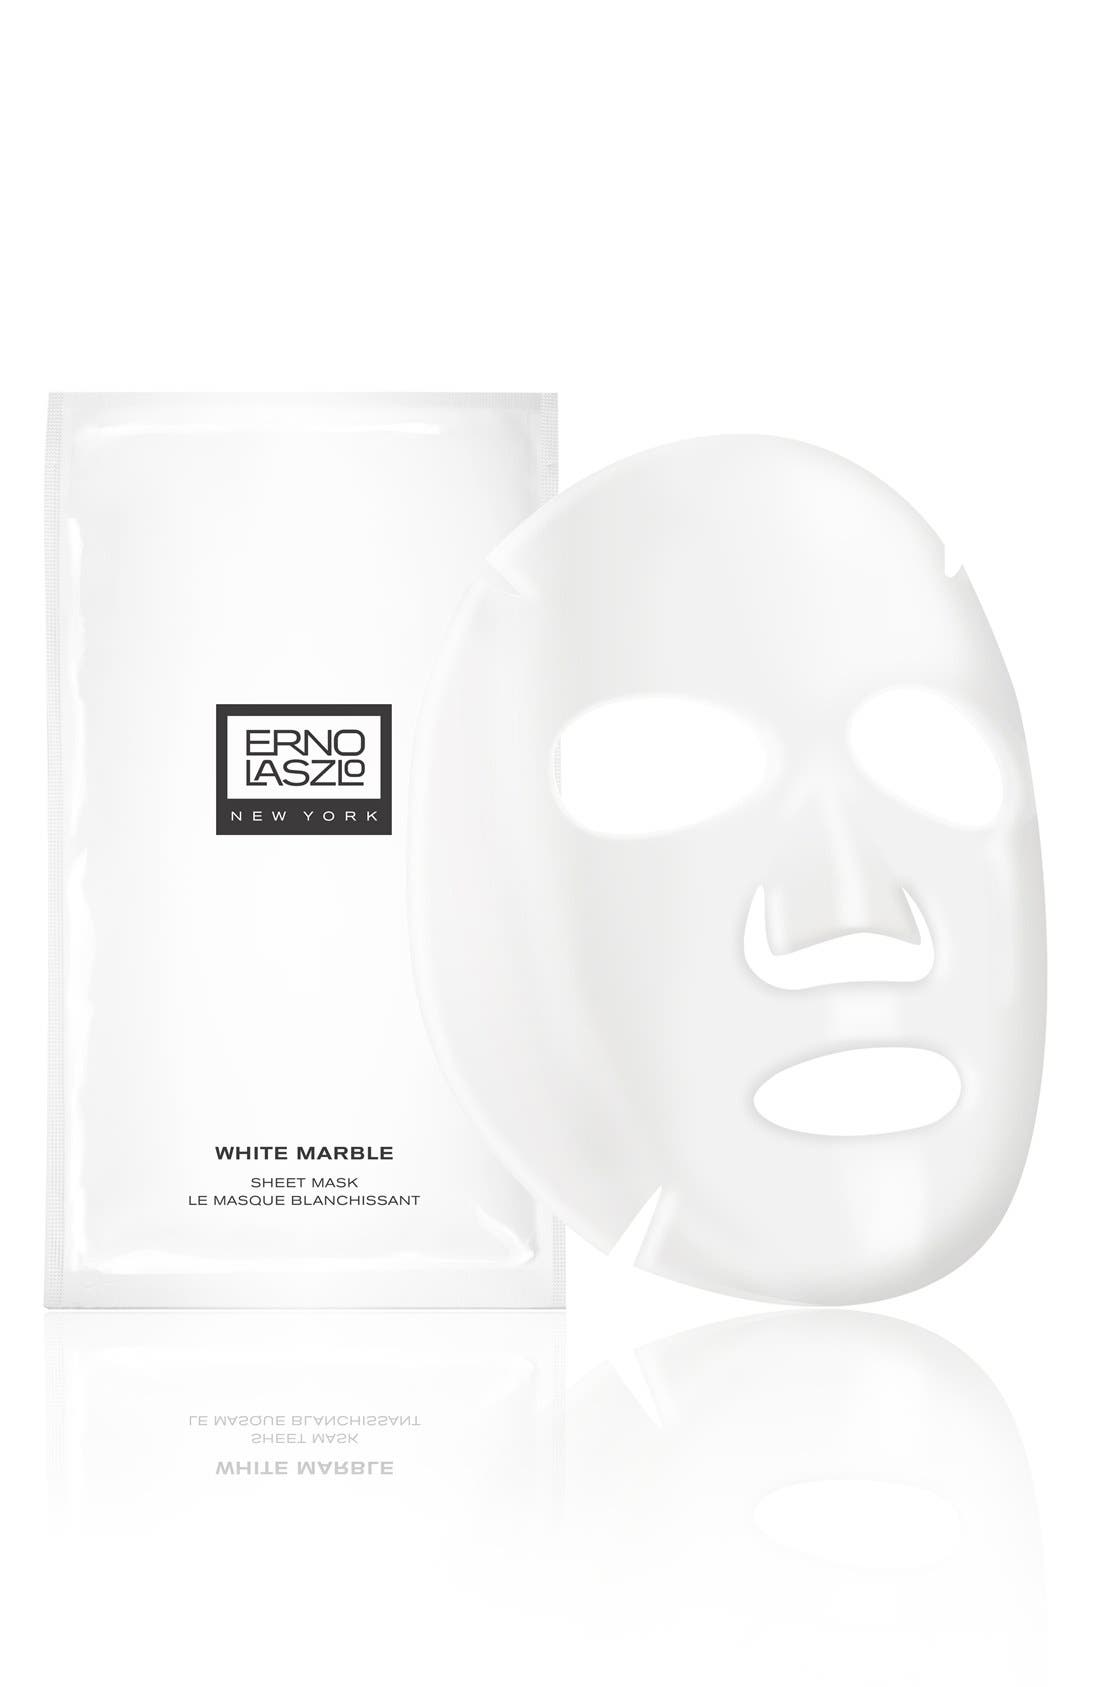 'White Marble' Sheet Mask,                             Main thumbnail 1, color,                             000